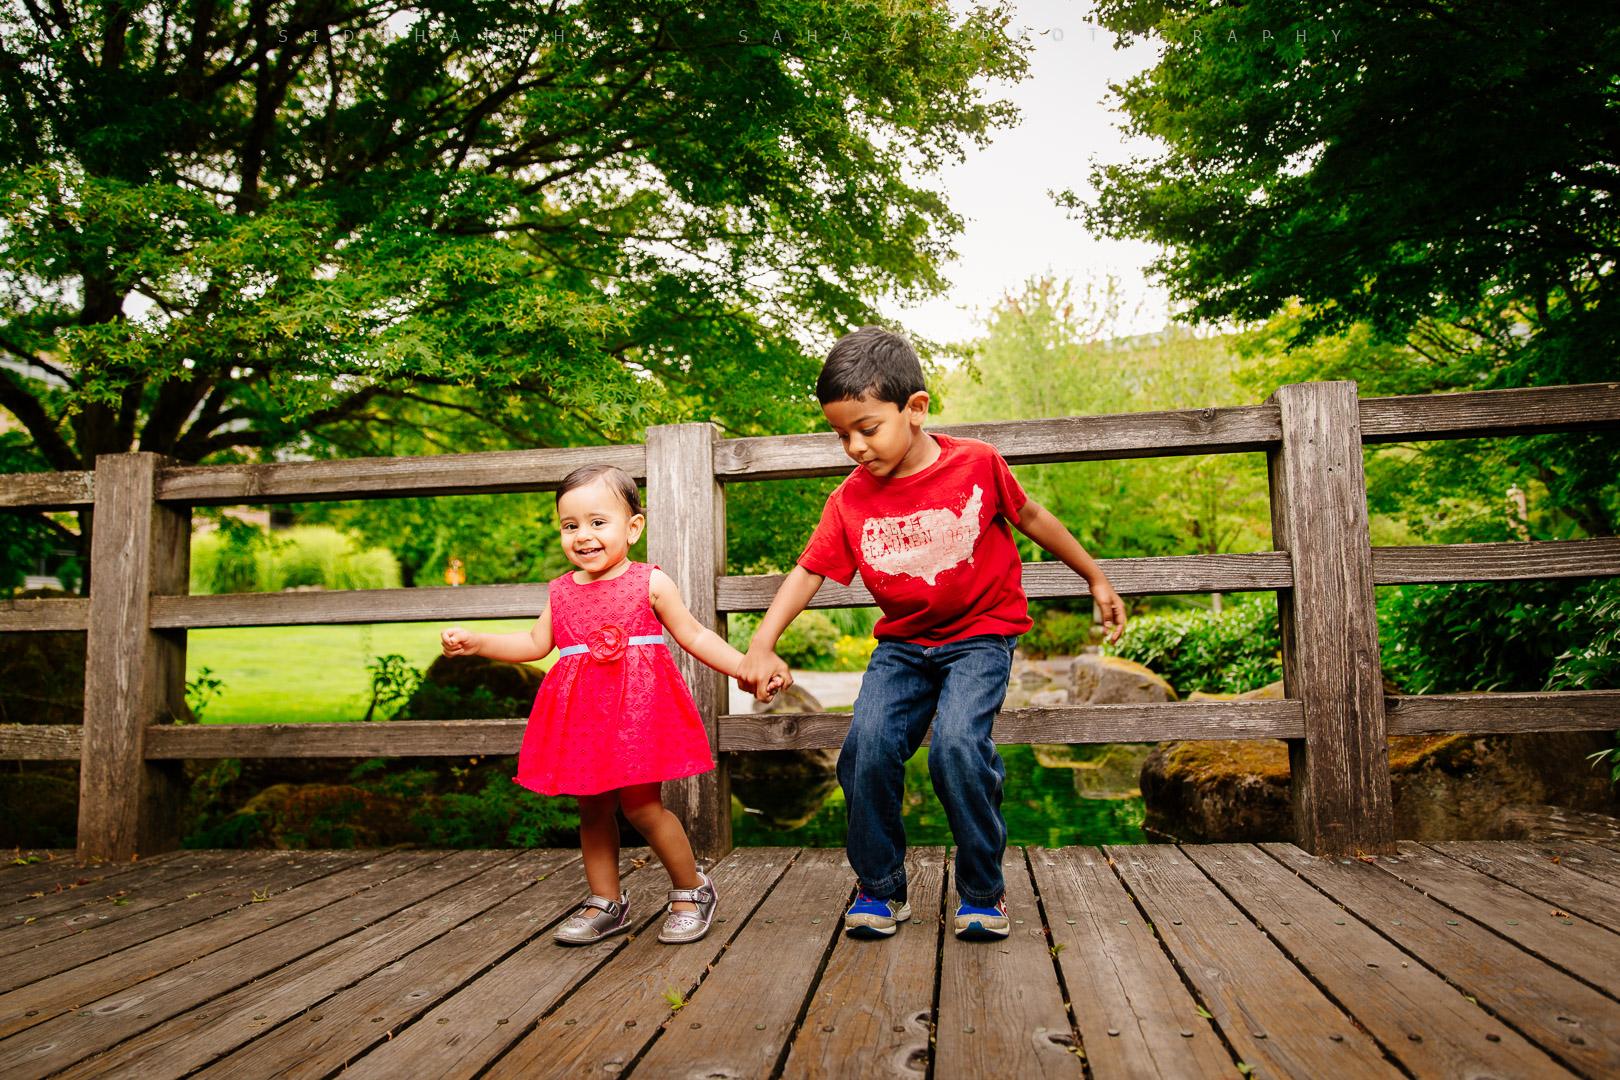 2015-08-08 - Padmaja Ketan Family Photoshoot - _05Y8682